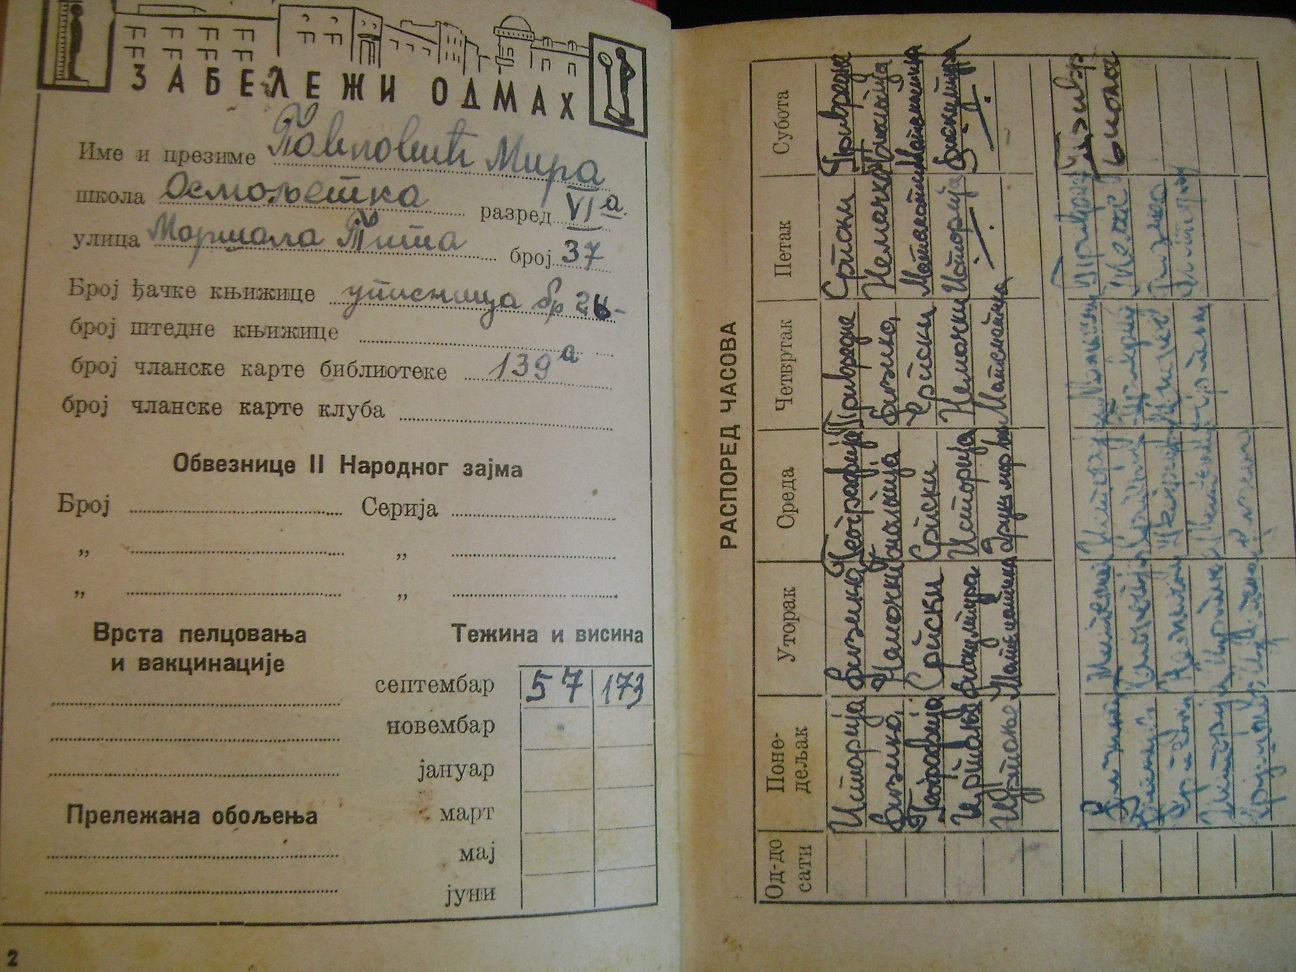 Đački_kalendar_1952-1953_4.JPG